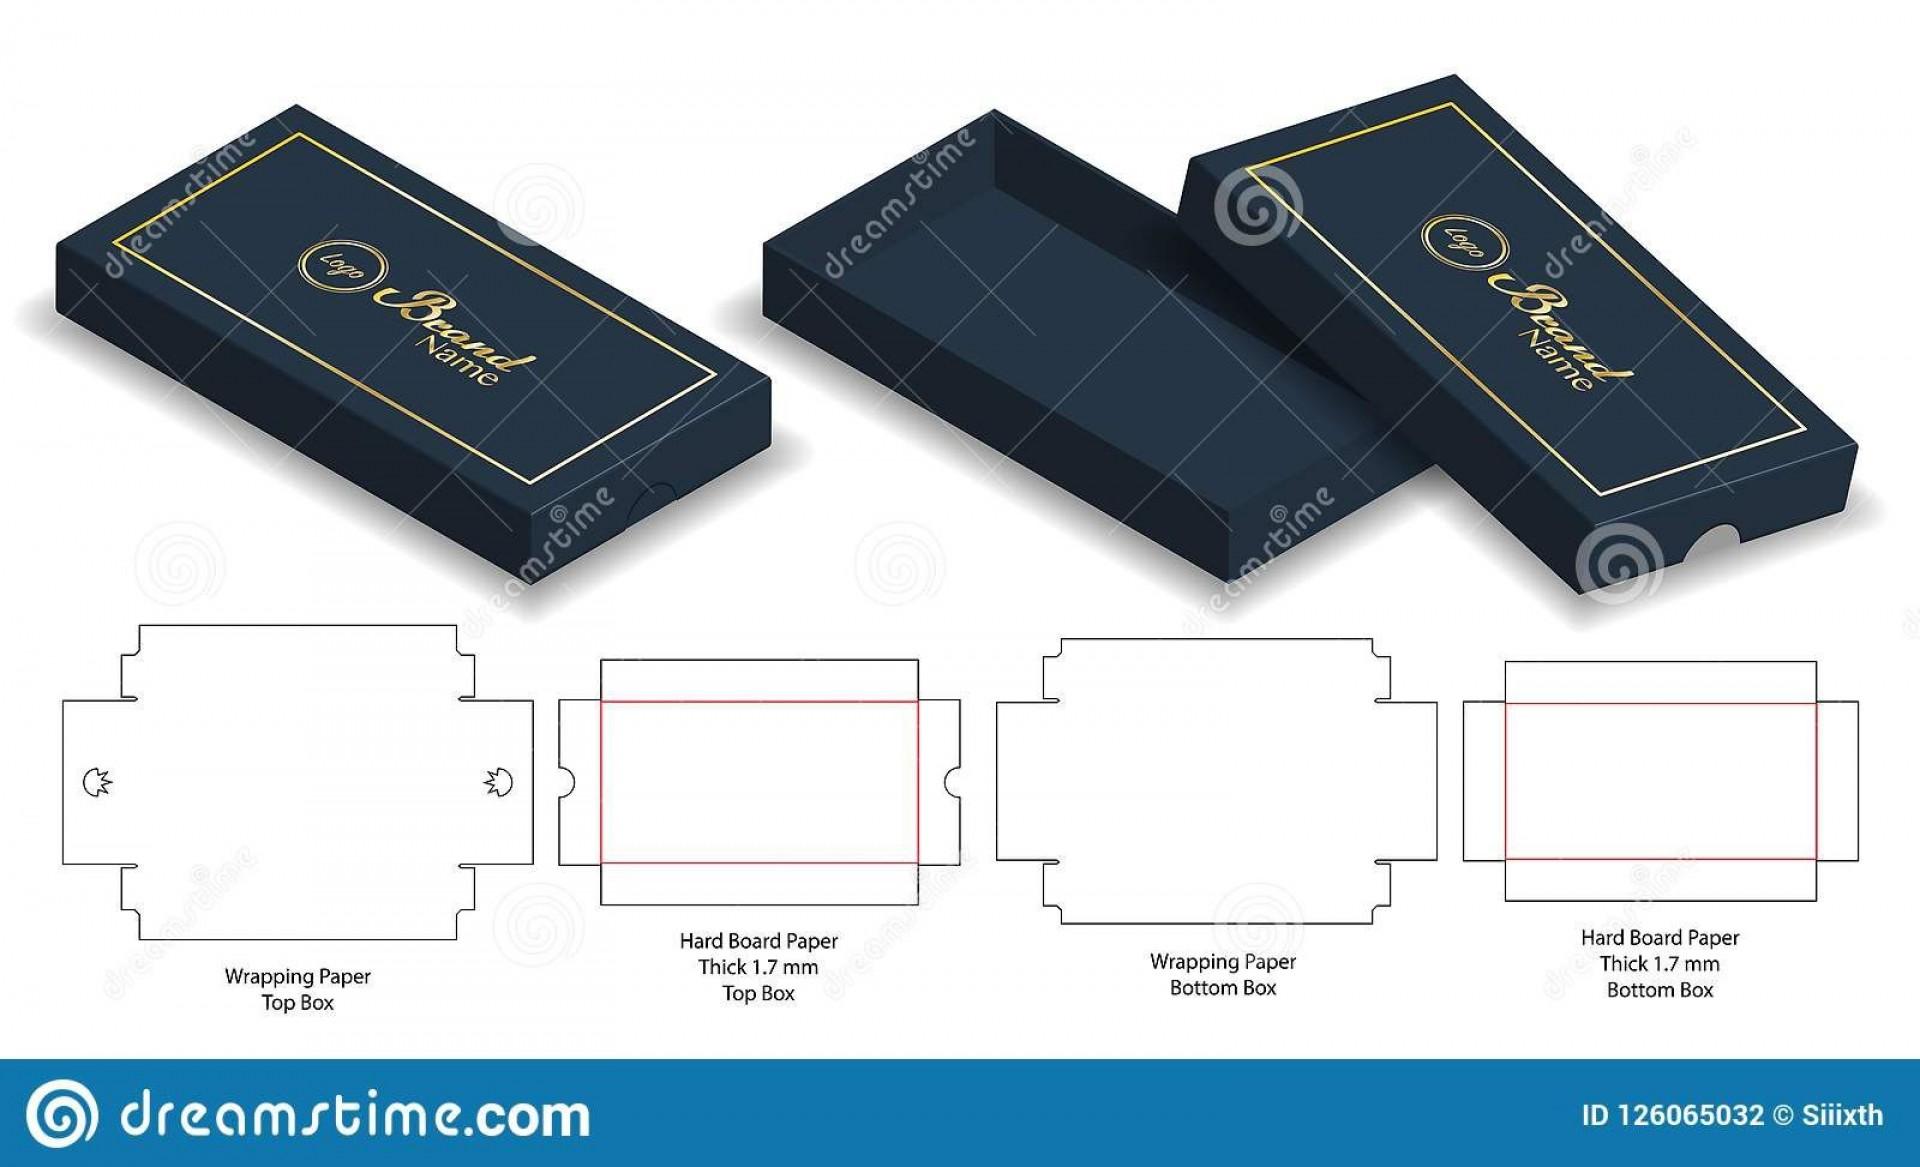 006 Wondrou Box Design Template Free Image  Text Download Packaging1920